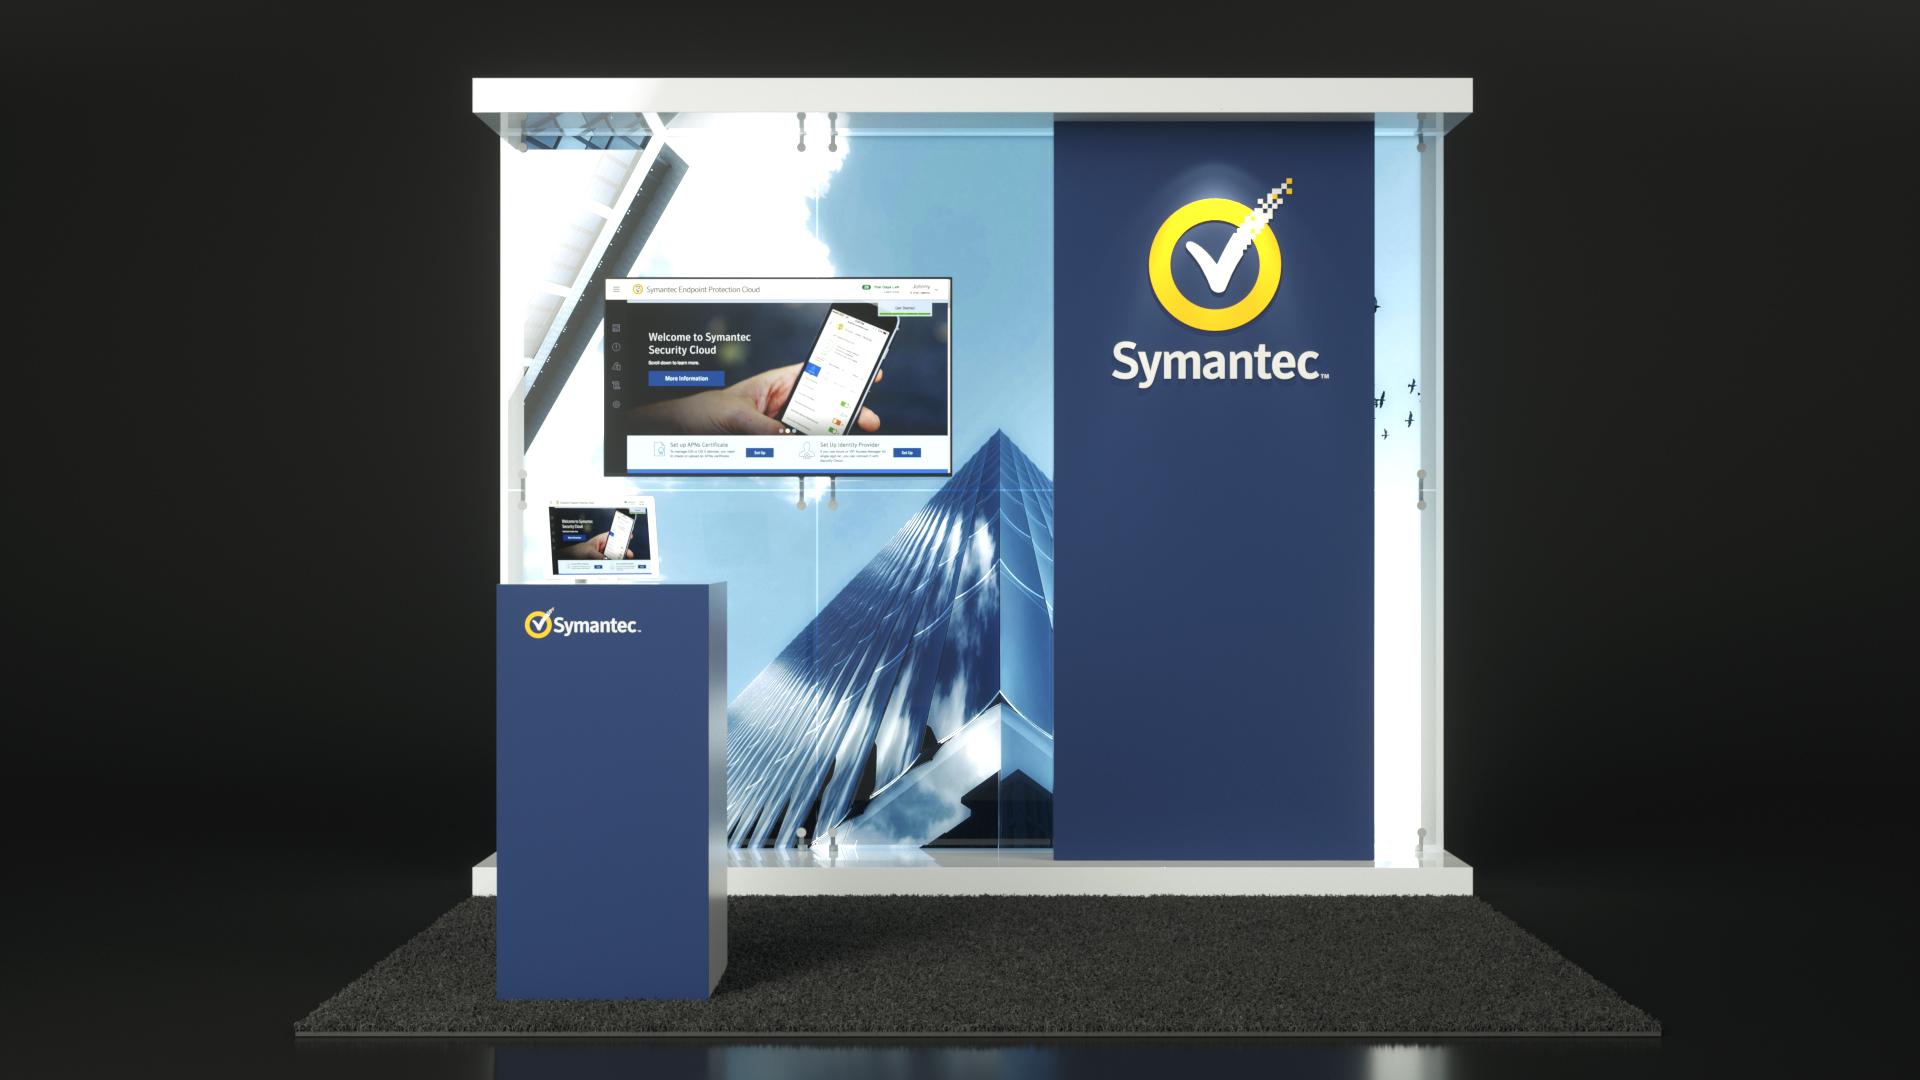 3417 - Symantec Canada - SecTor 2018 - View 4.jpg